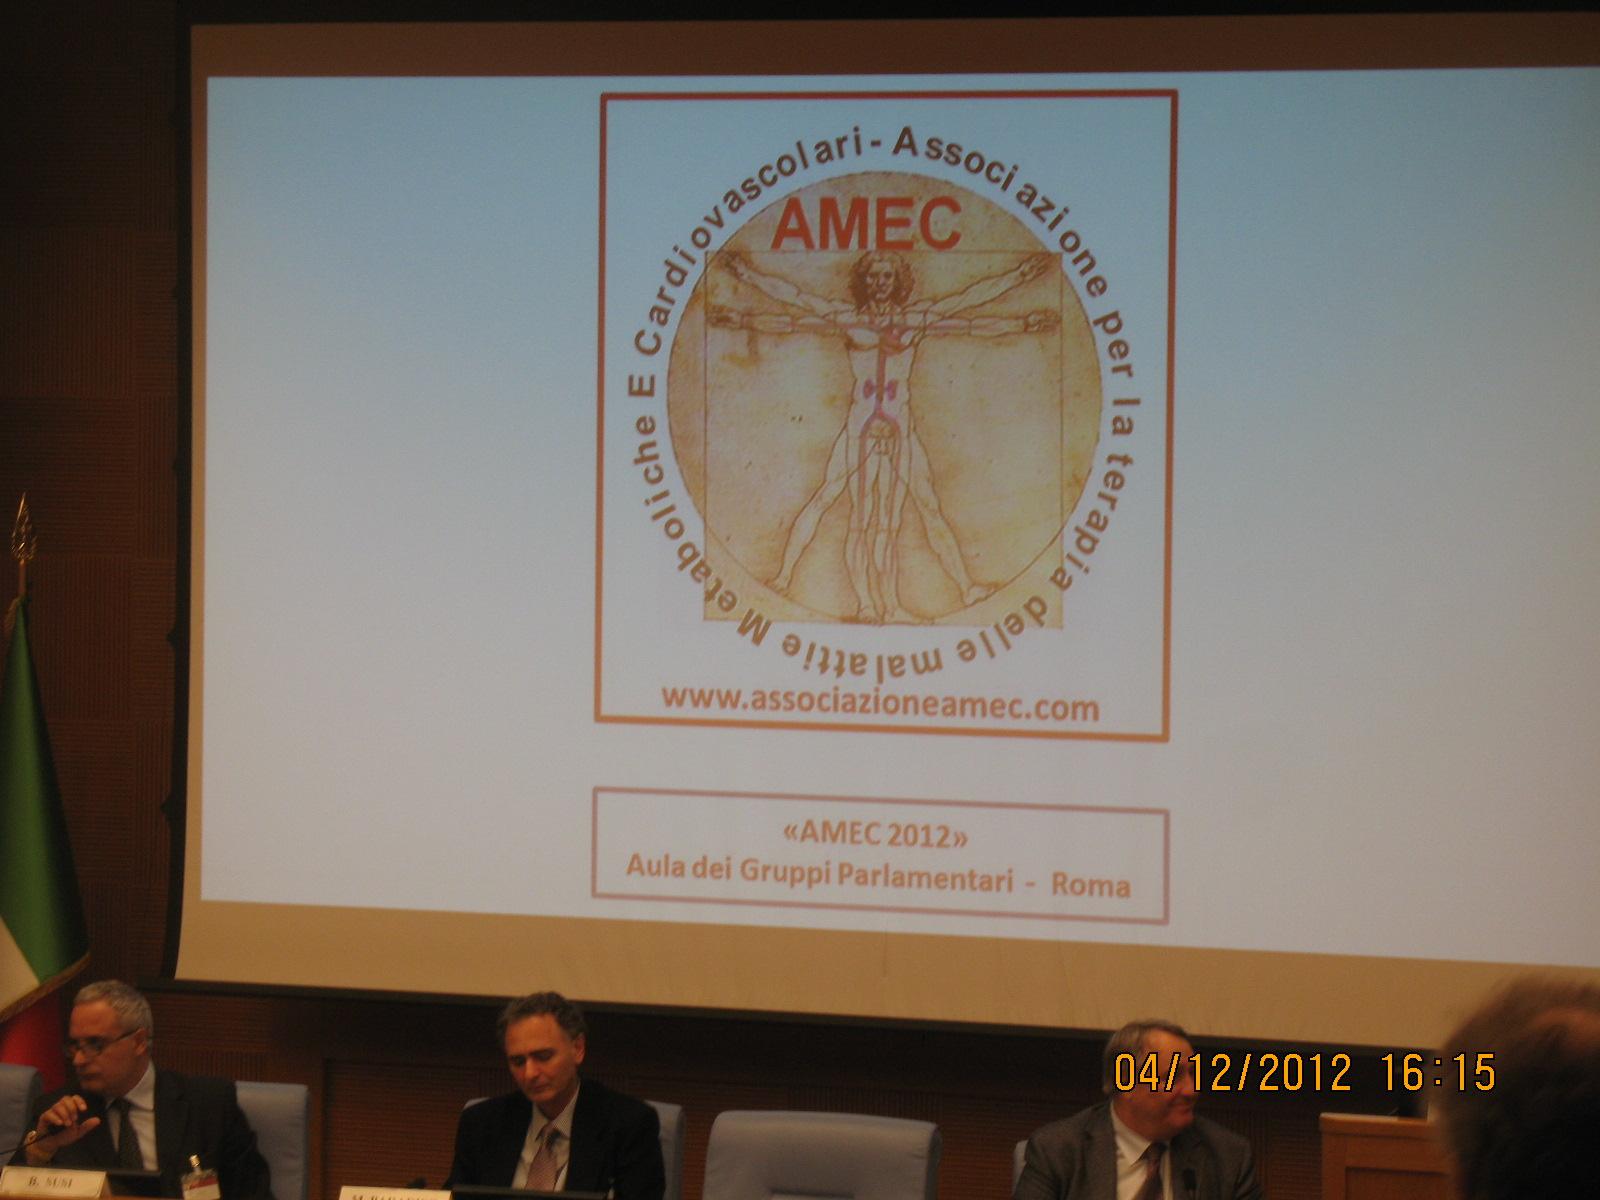 http://associazioneamec.com/amec/images/foto/IMG_1.JPG